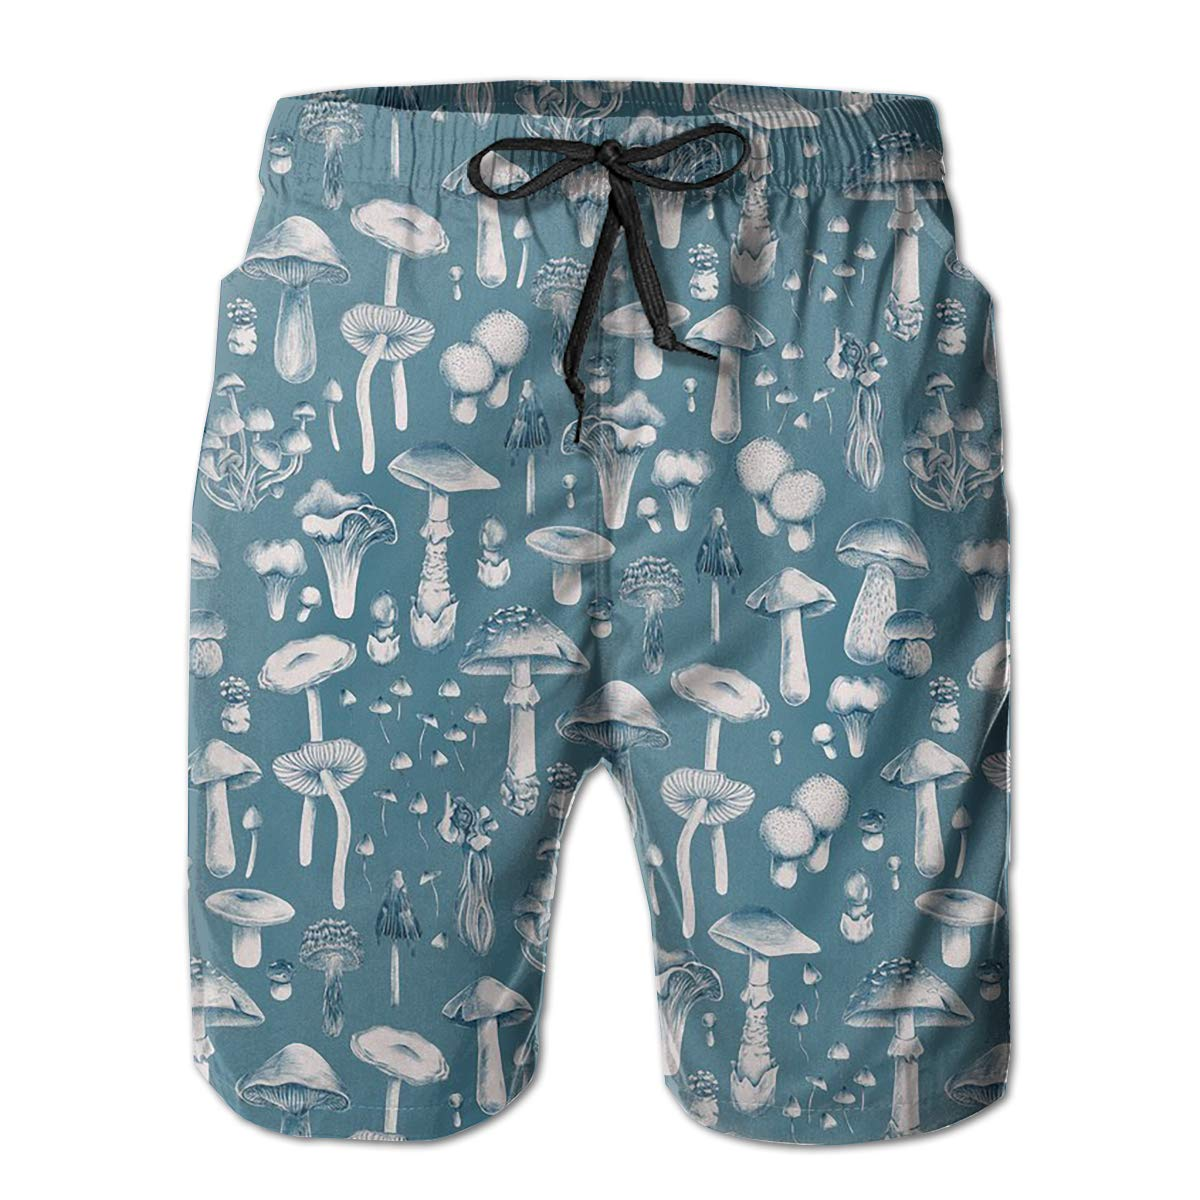 FUNSTYEET Blue Mushrooms Mens Board Shorts Swim Mesh Lining and Side Pocket